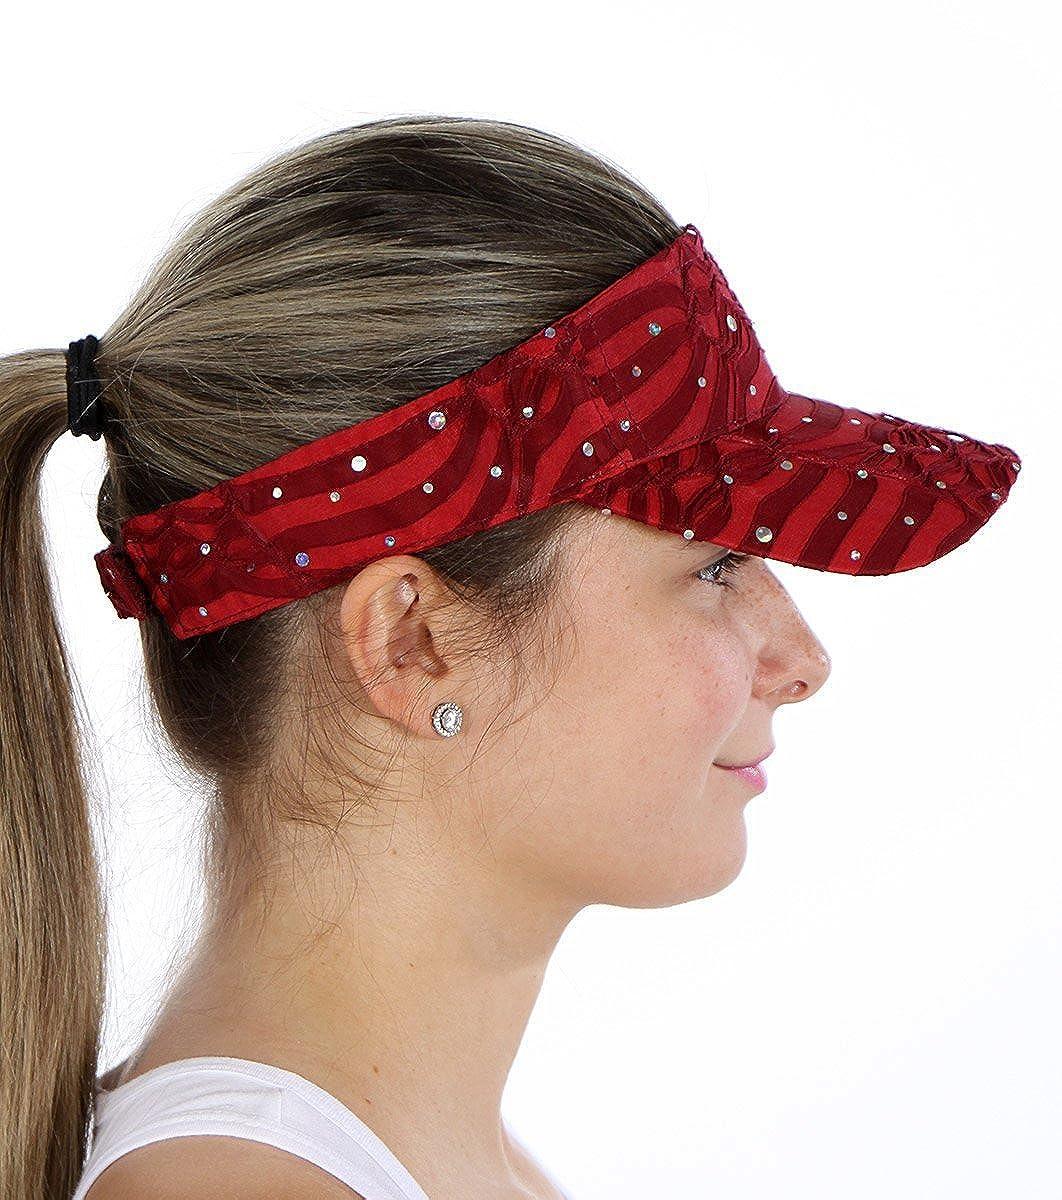 Sun Visor Hat, Wide Brim Headband, Outdoor Sports, Sequined, Adjustable Velcroat, SPF UPF UV Black